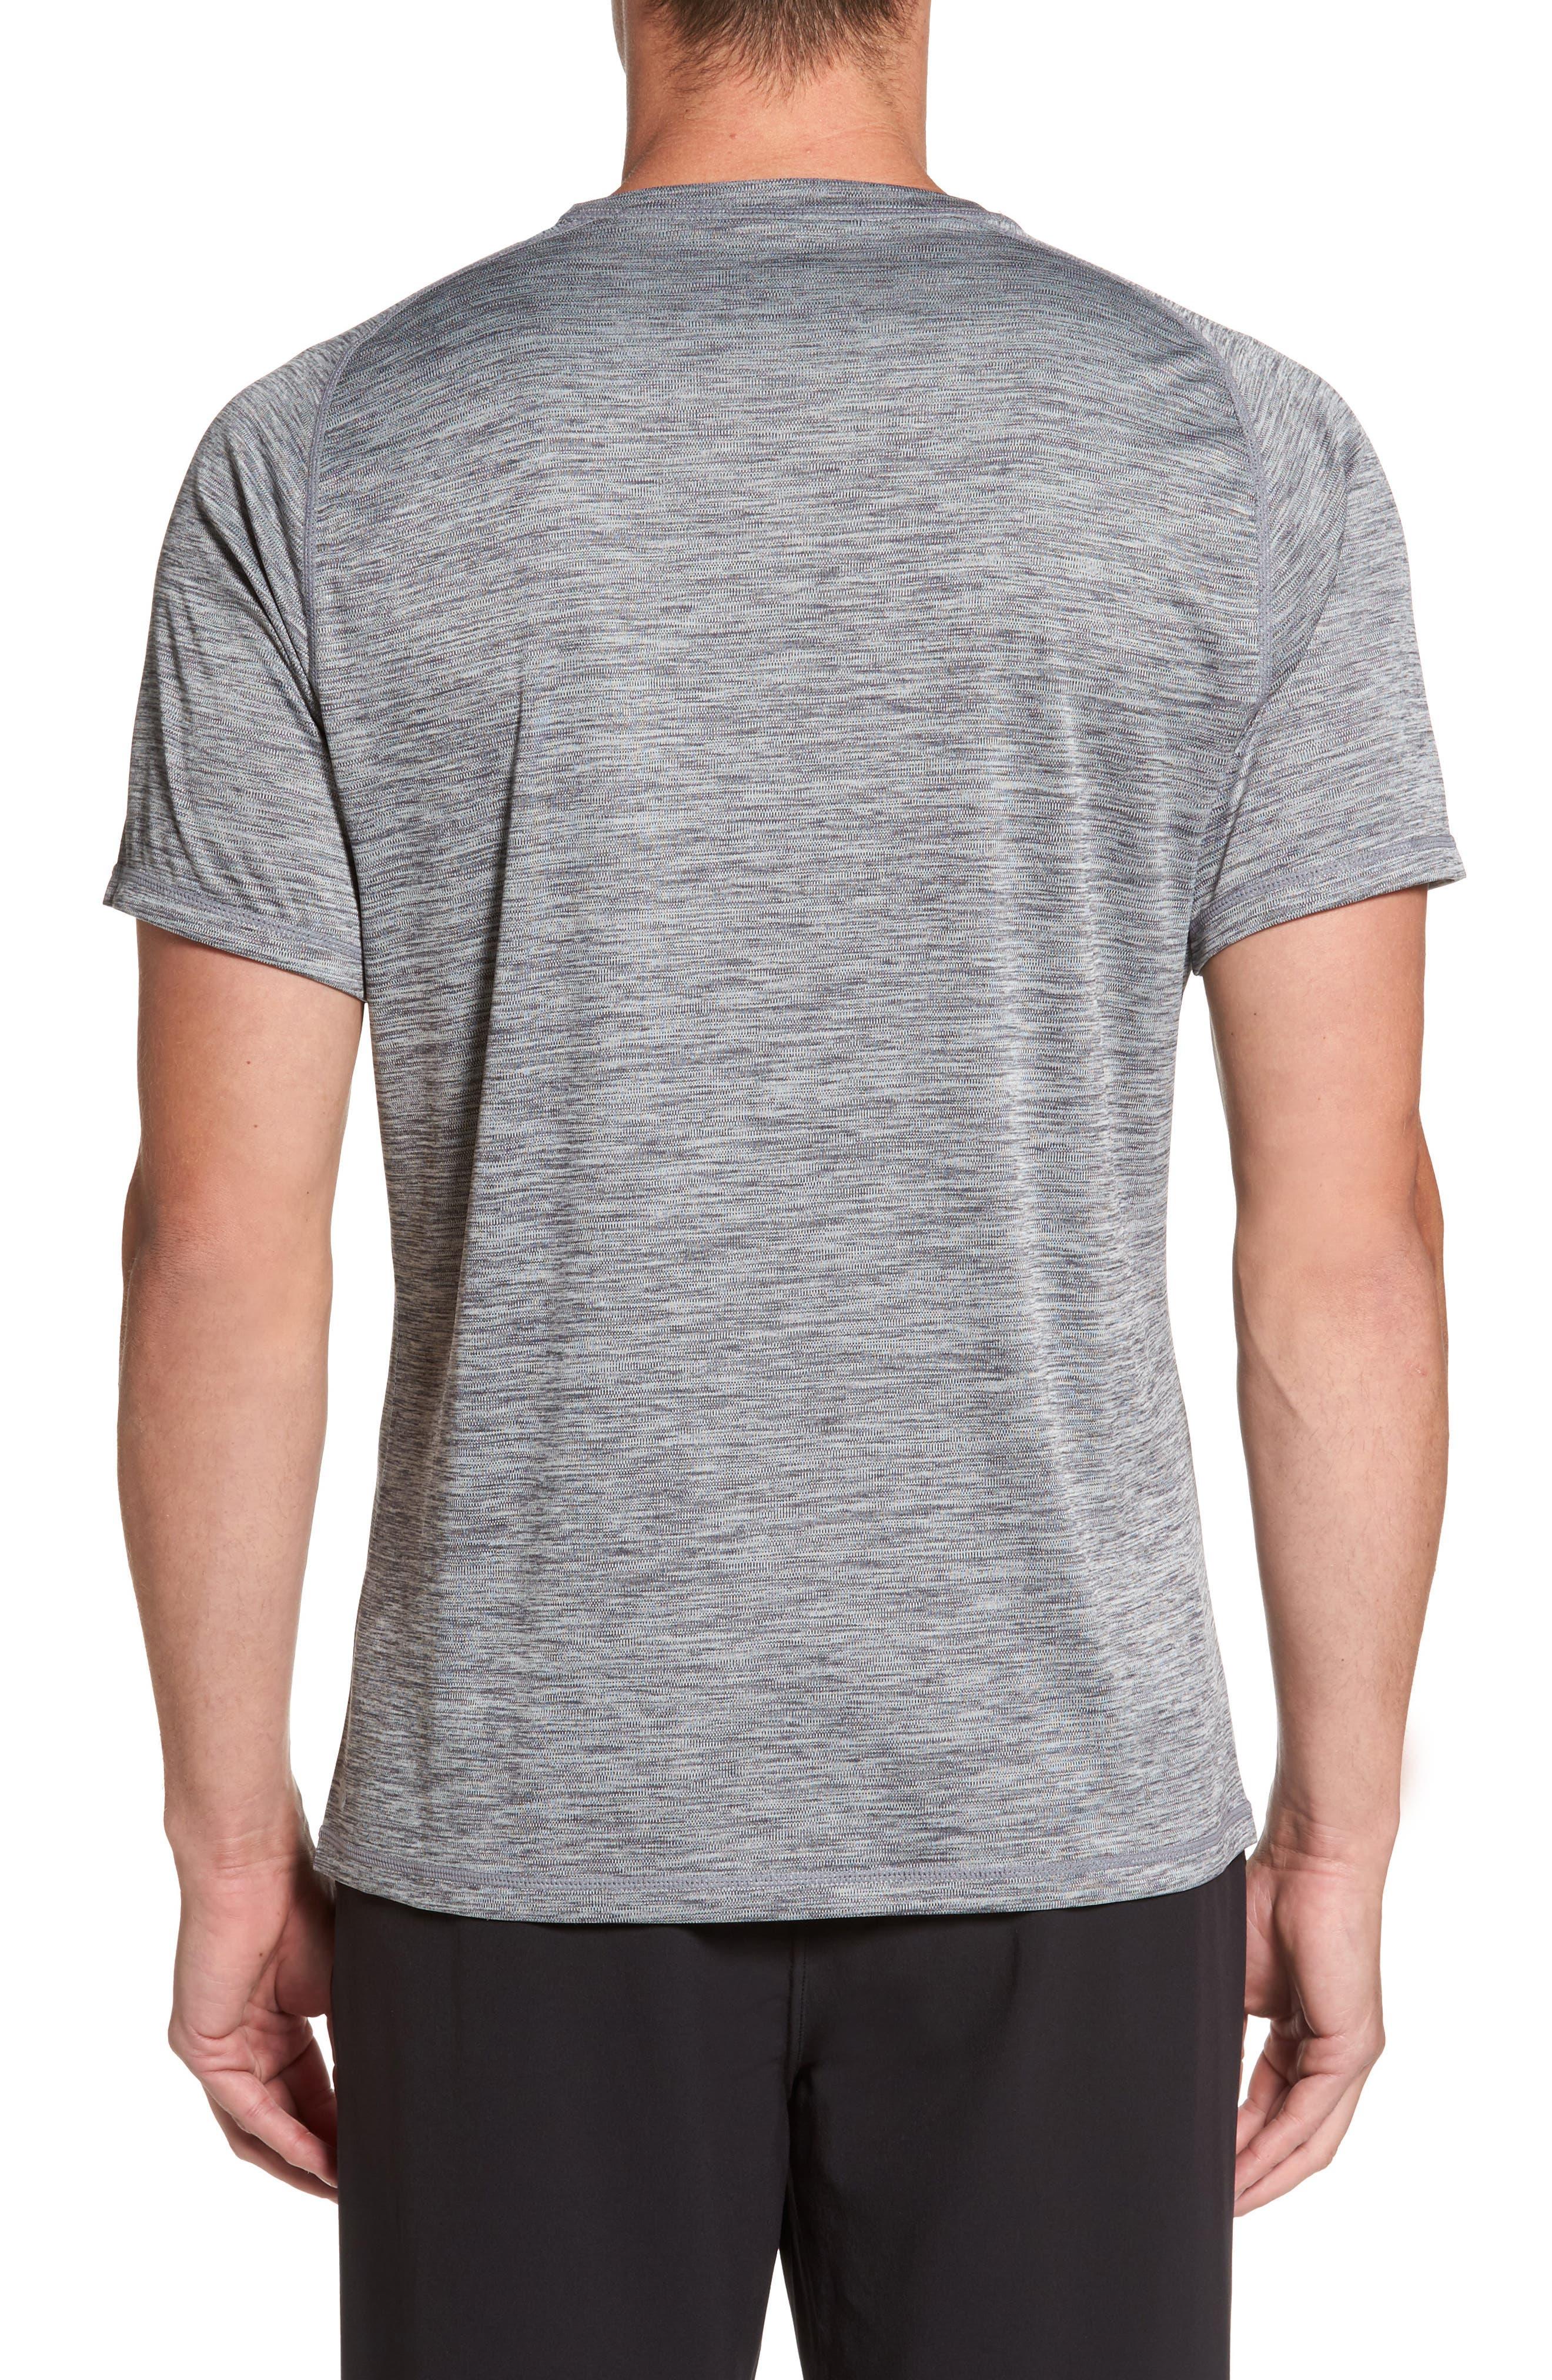 ZELLA,                             Triplite T-Shirt,                             Alternate thumbnail 2, color,                             050